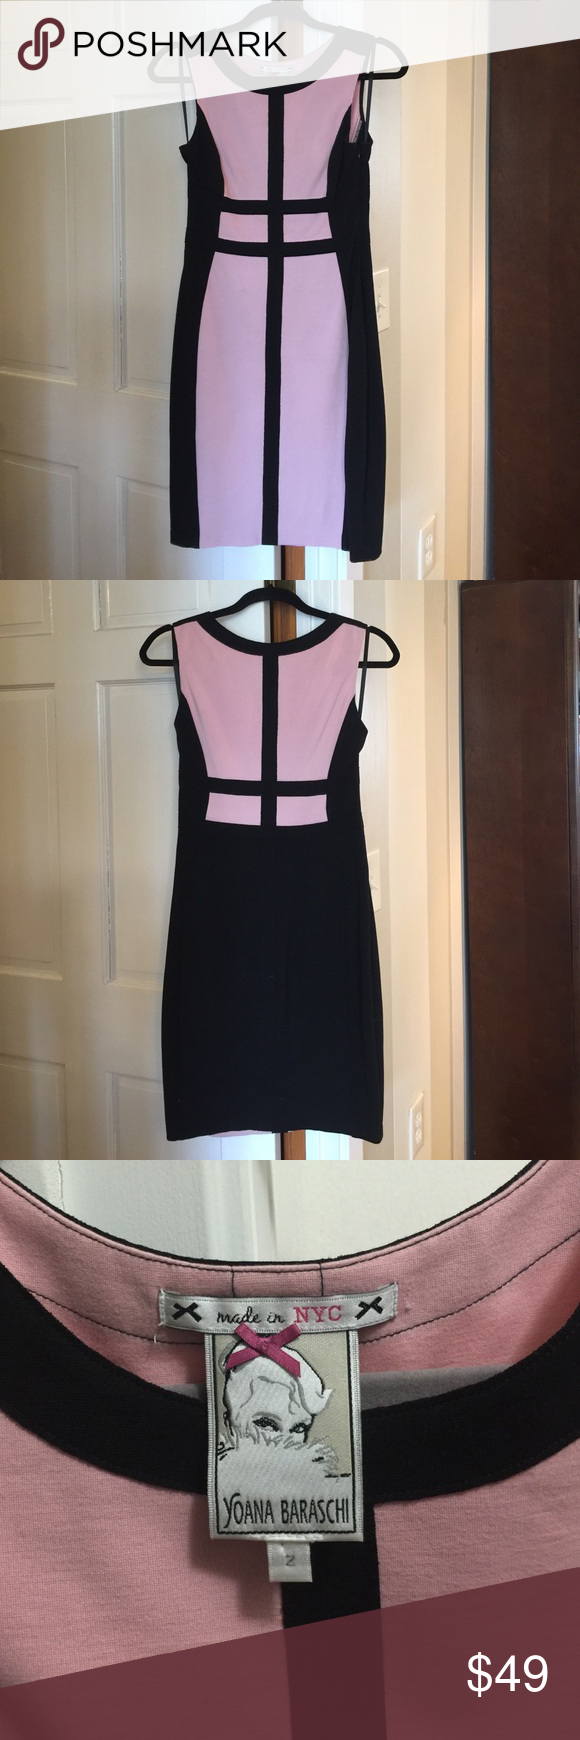 Yoana baraschi debie black dress pink black body pink black and